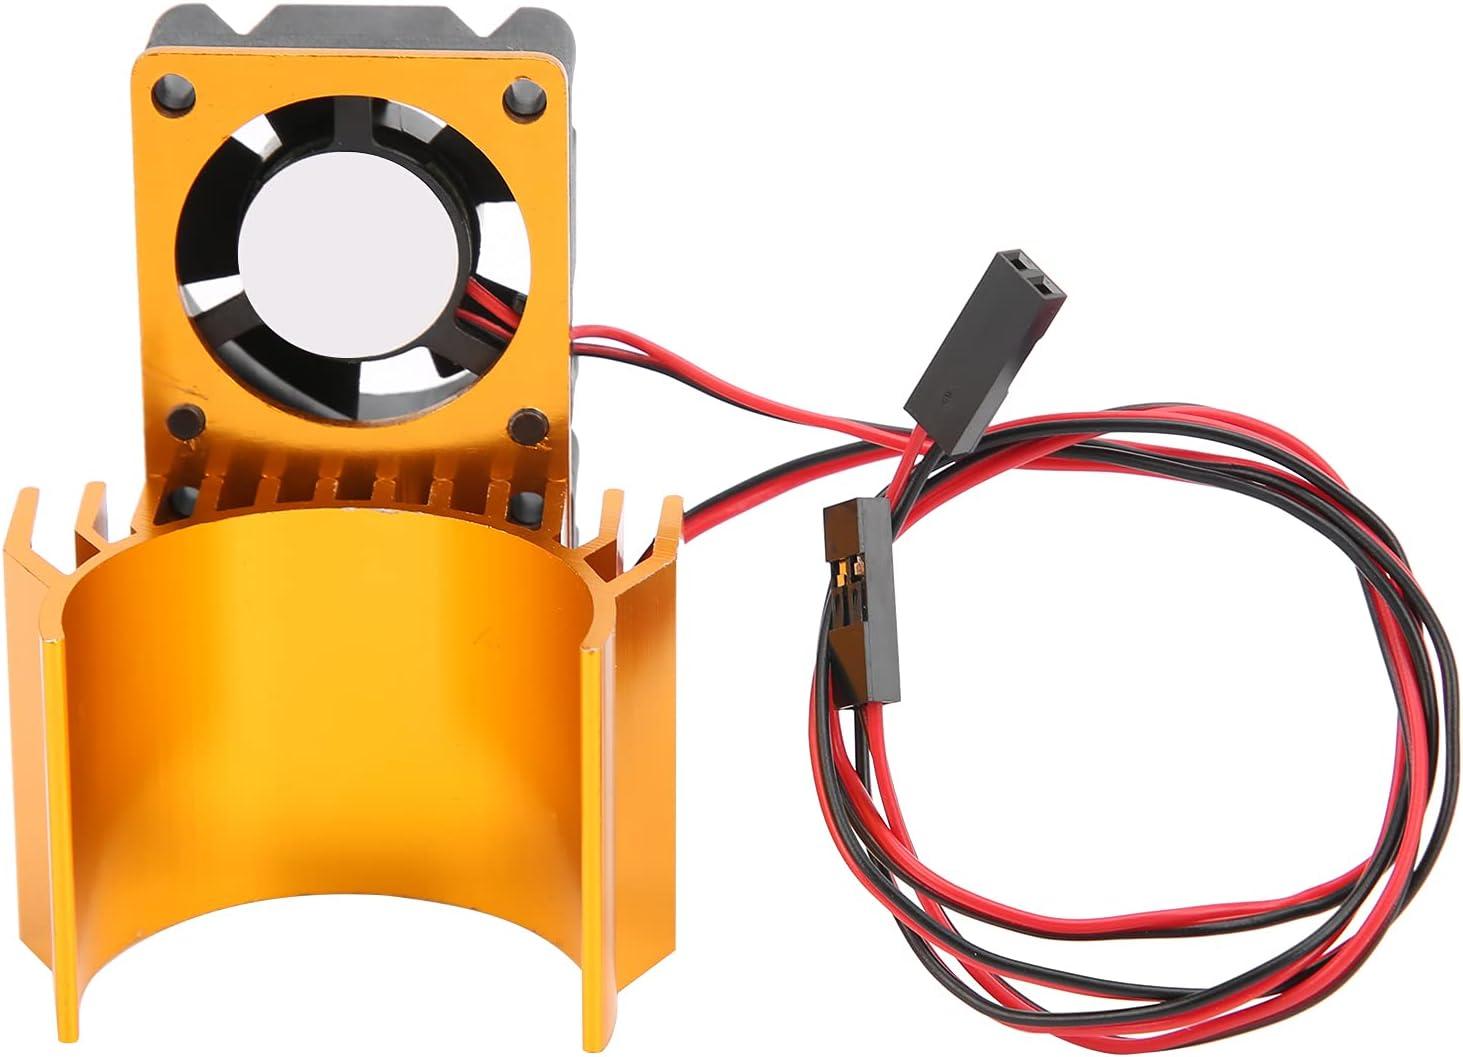 VGEBY RC Max 58% OFF Car Motor Heatsink Double 10 1 Max 76% OFF Fan Cooling